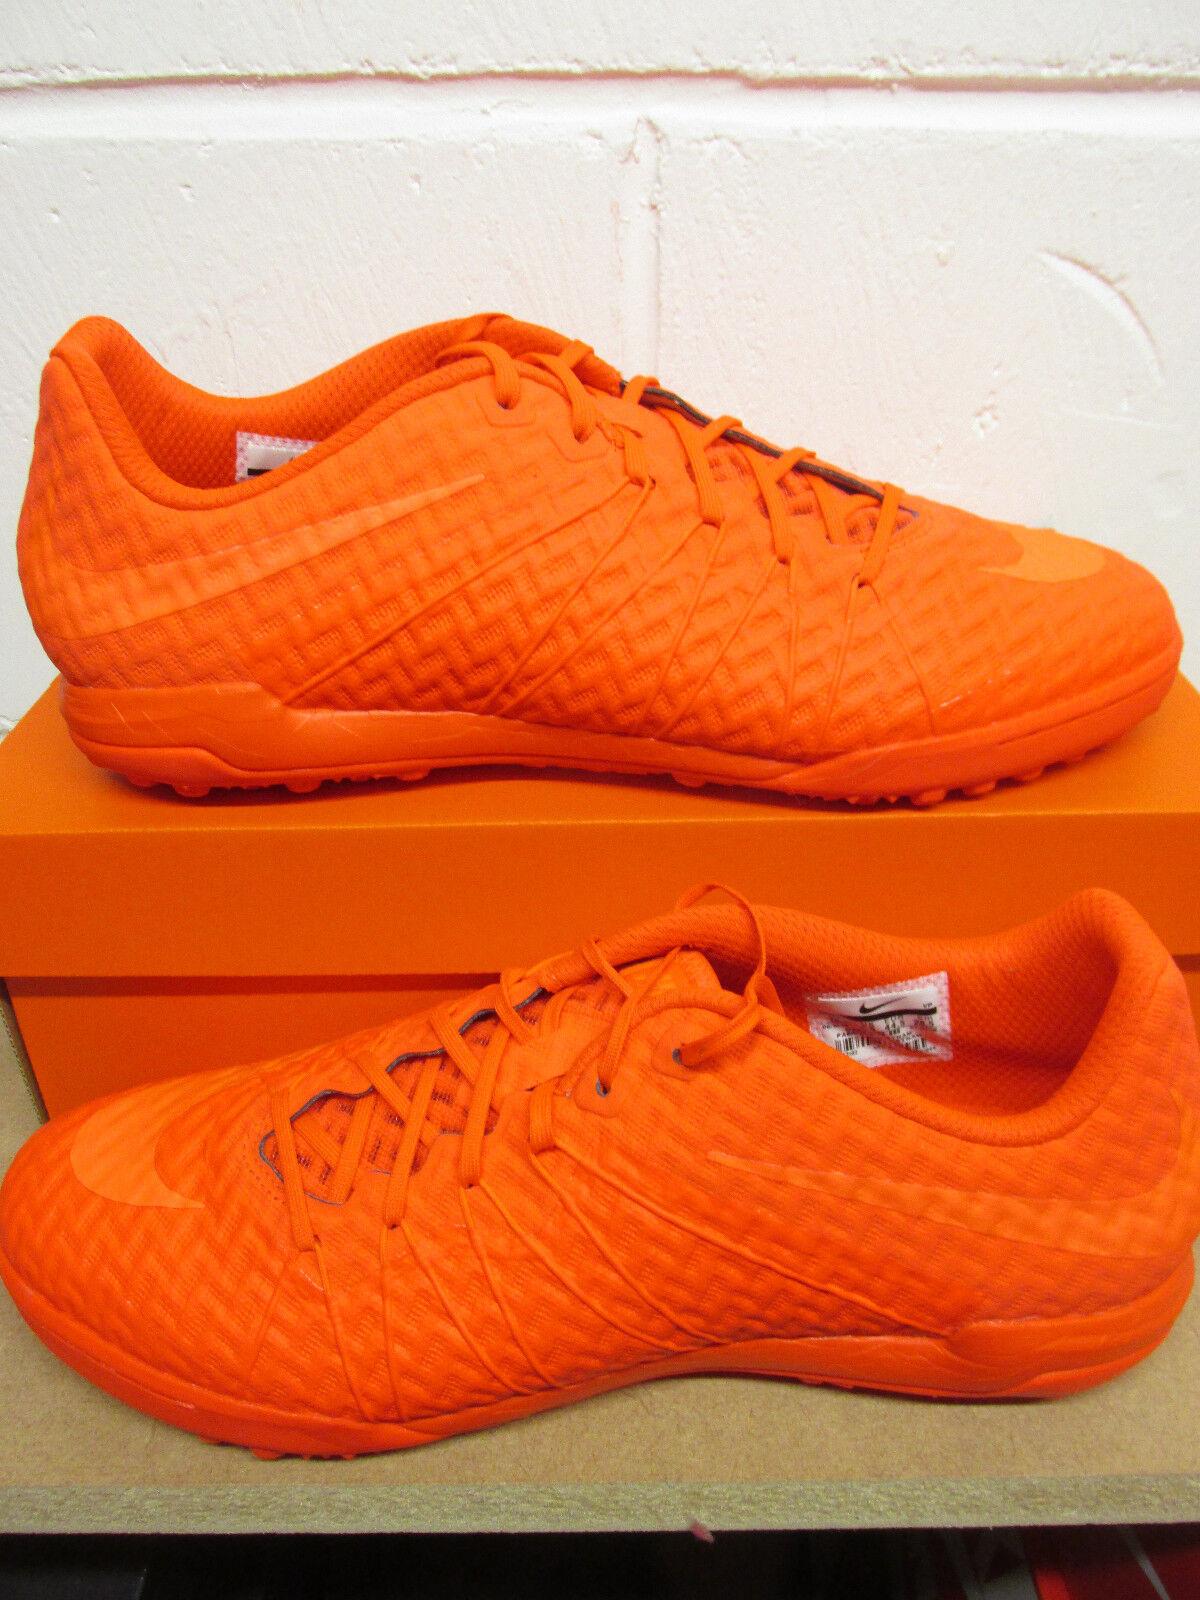 Nike HypervenomX Finale TF Mens Football Boots 749888 688 Soccer Cleats